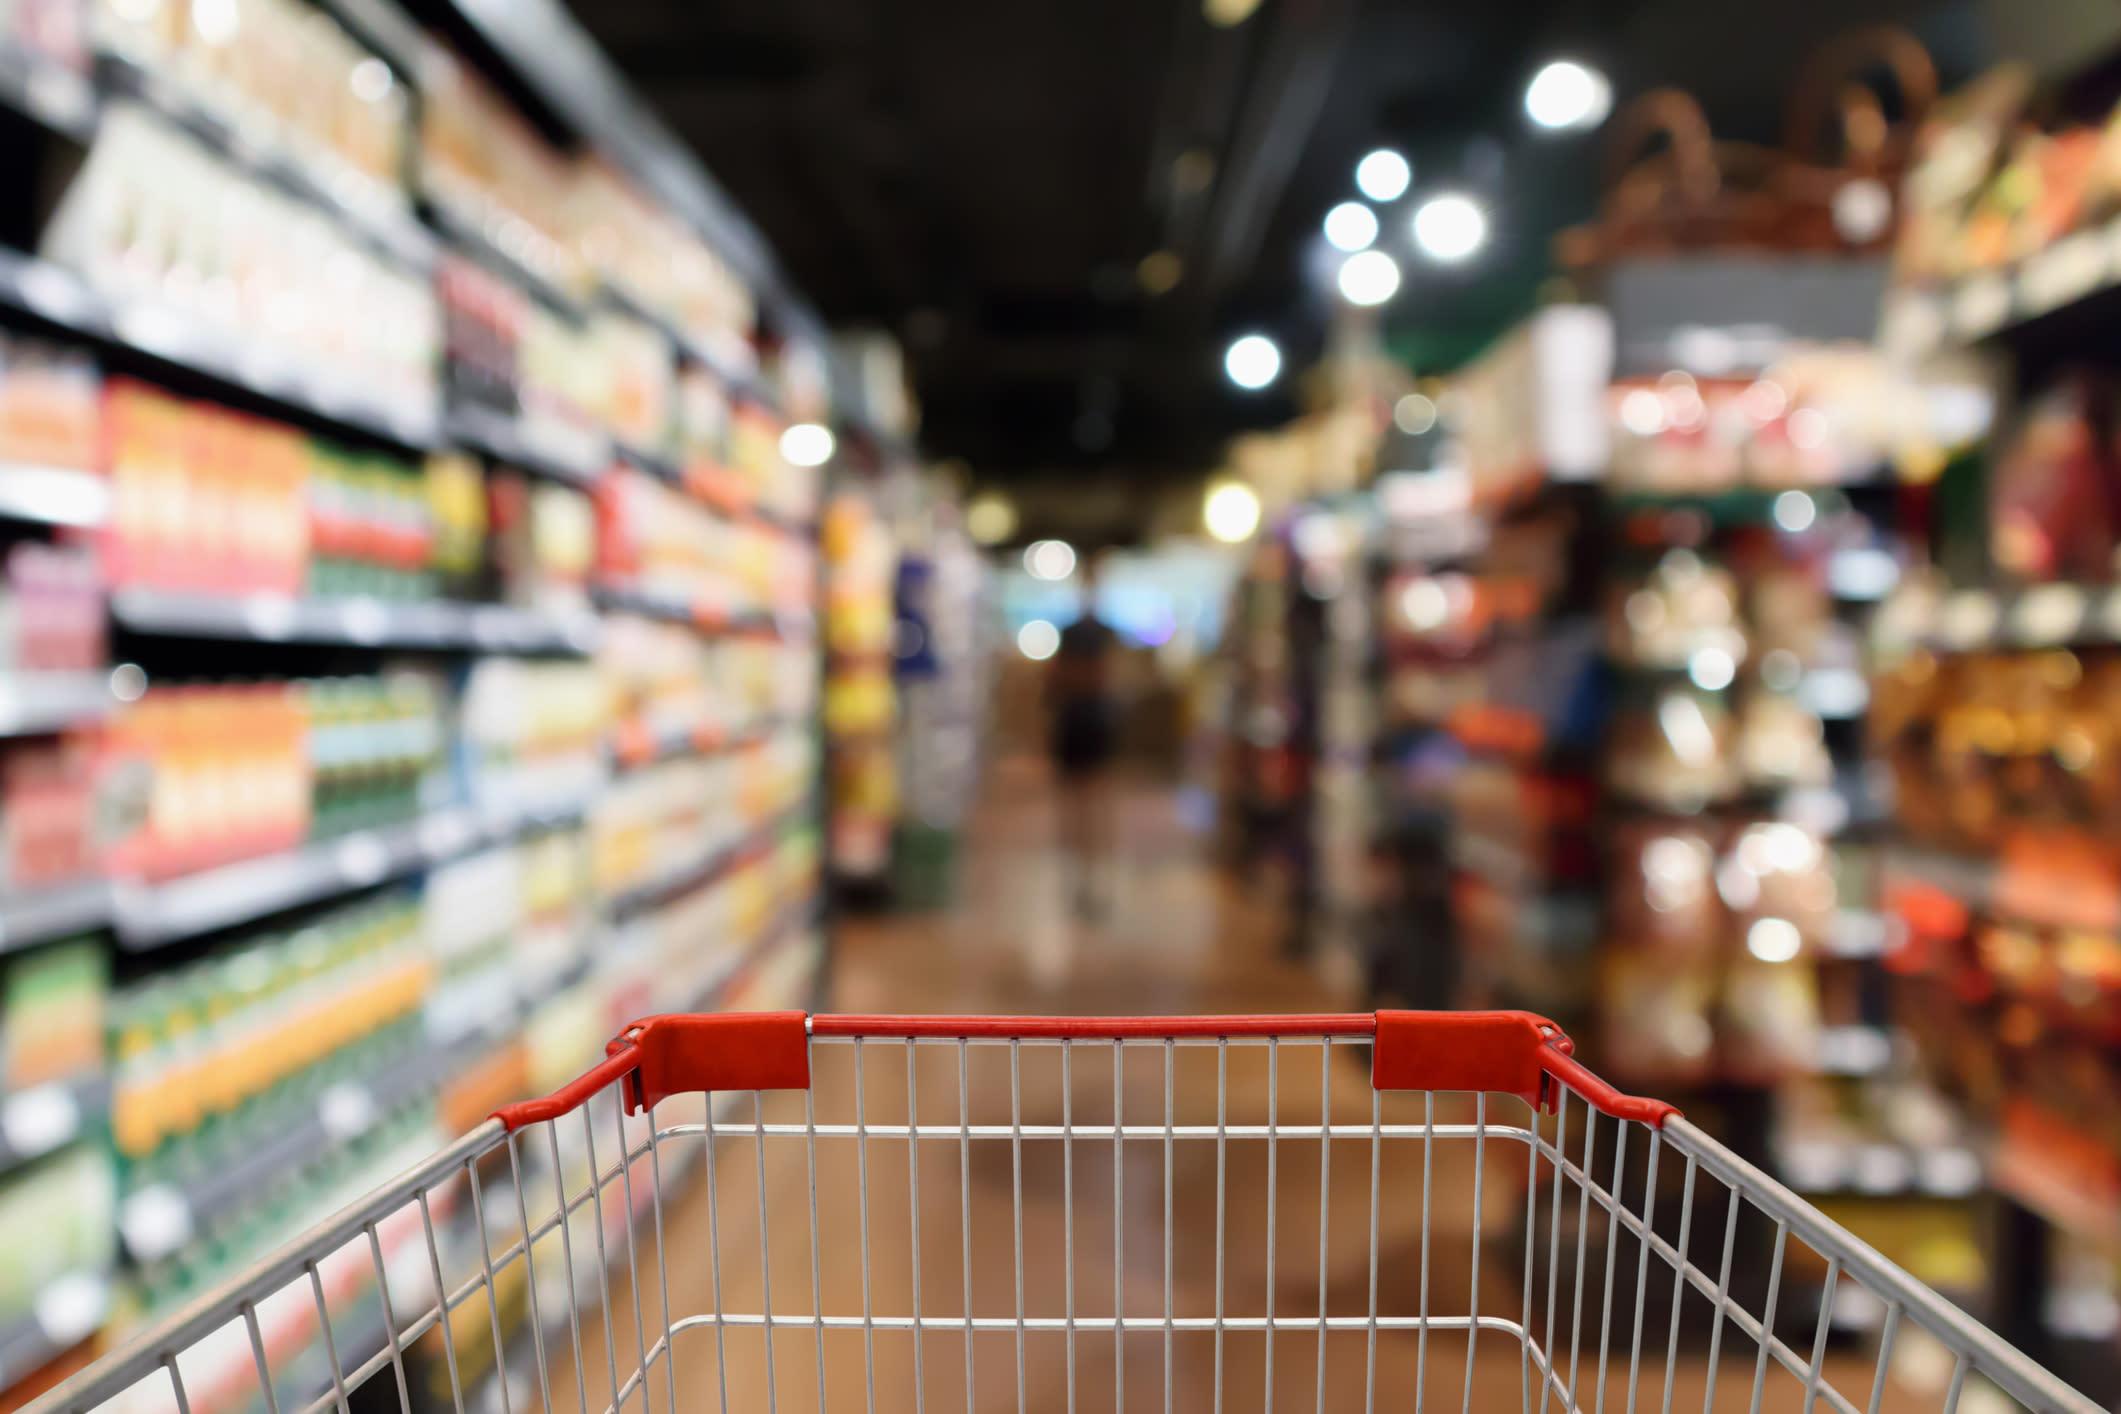 Does Kroger Accept Ebt For Grocery Pickup